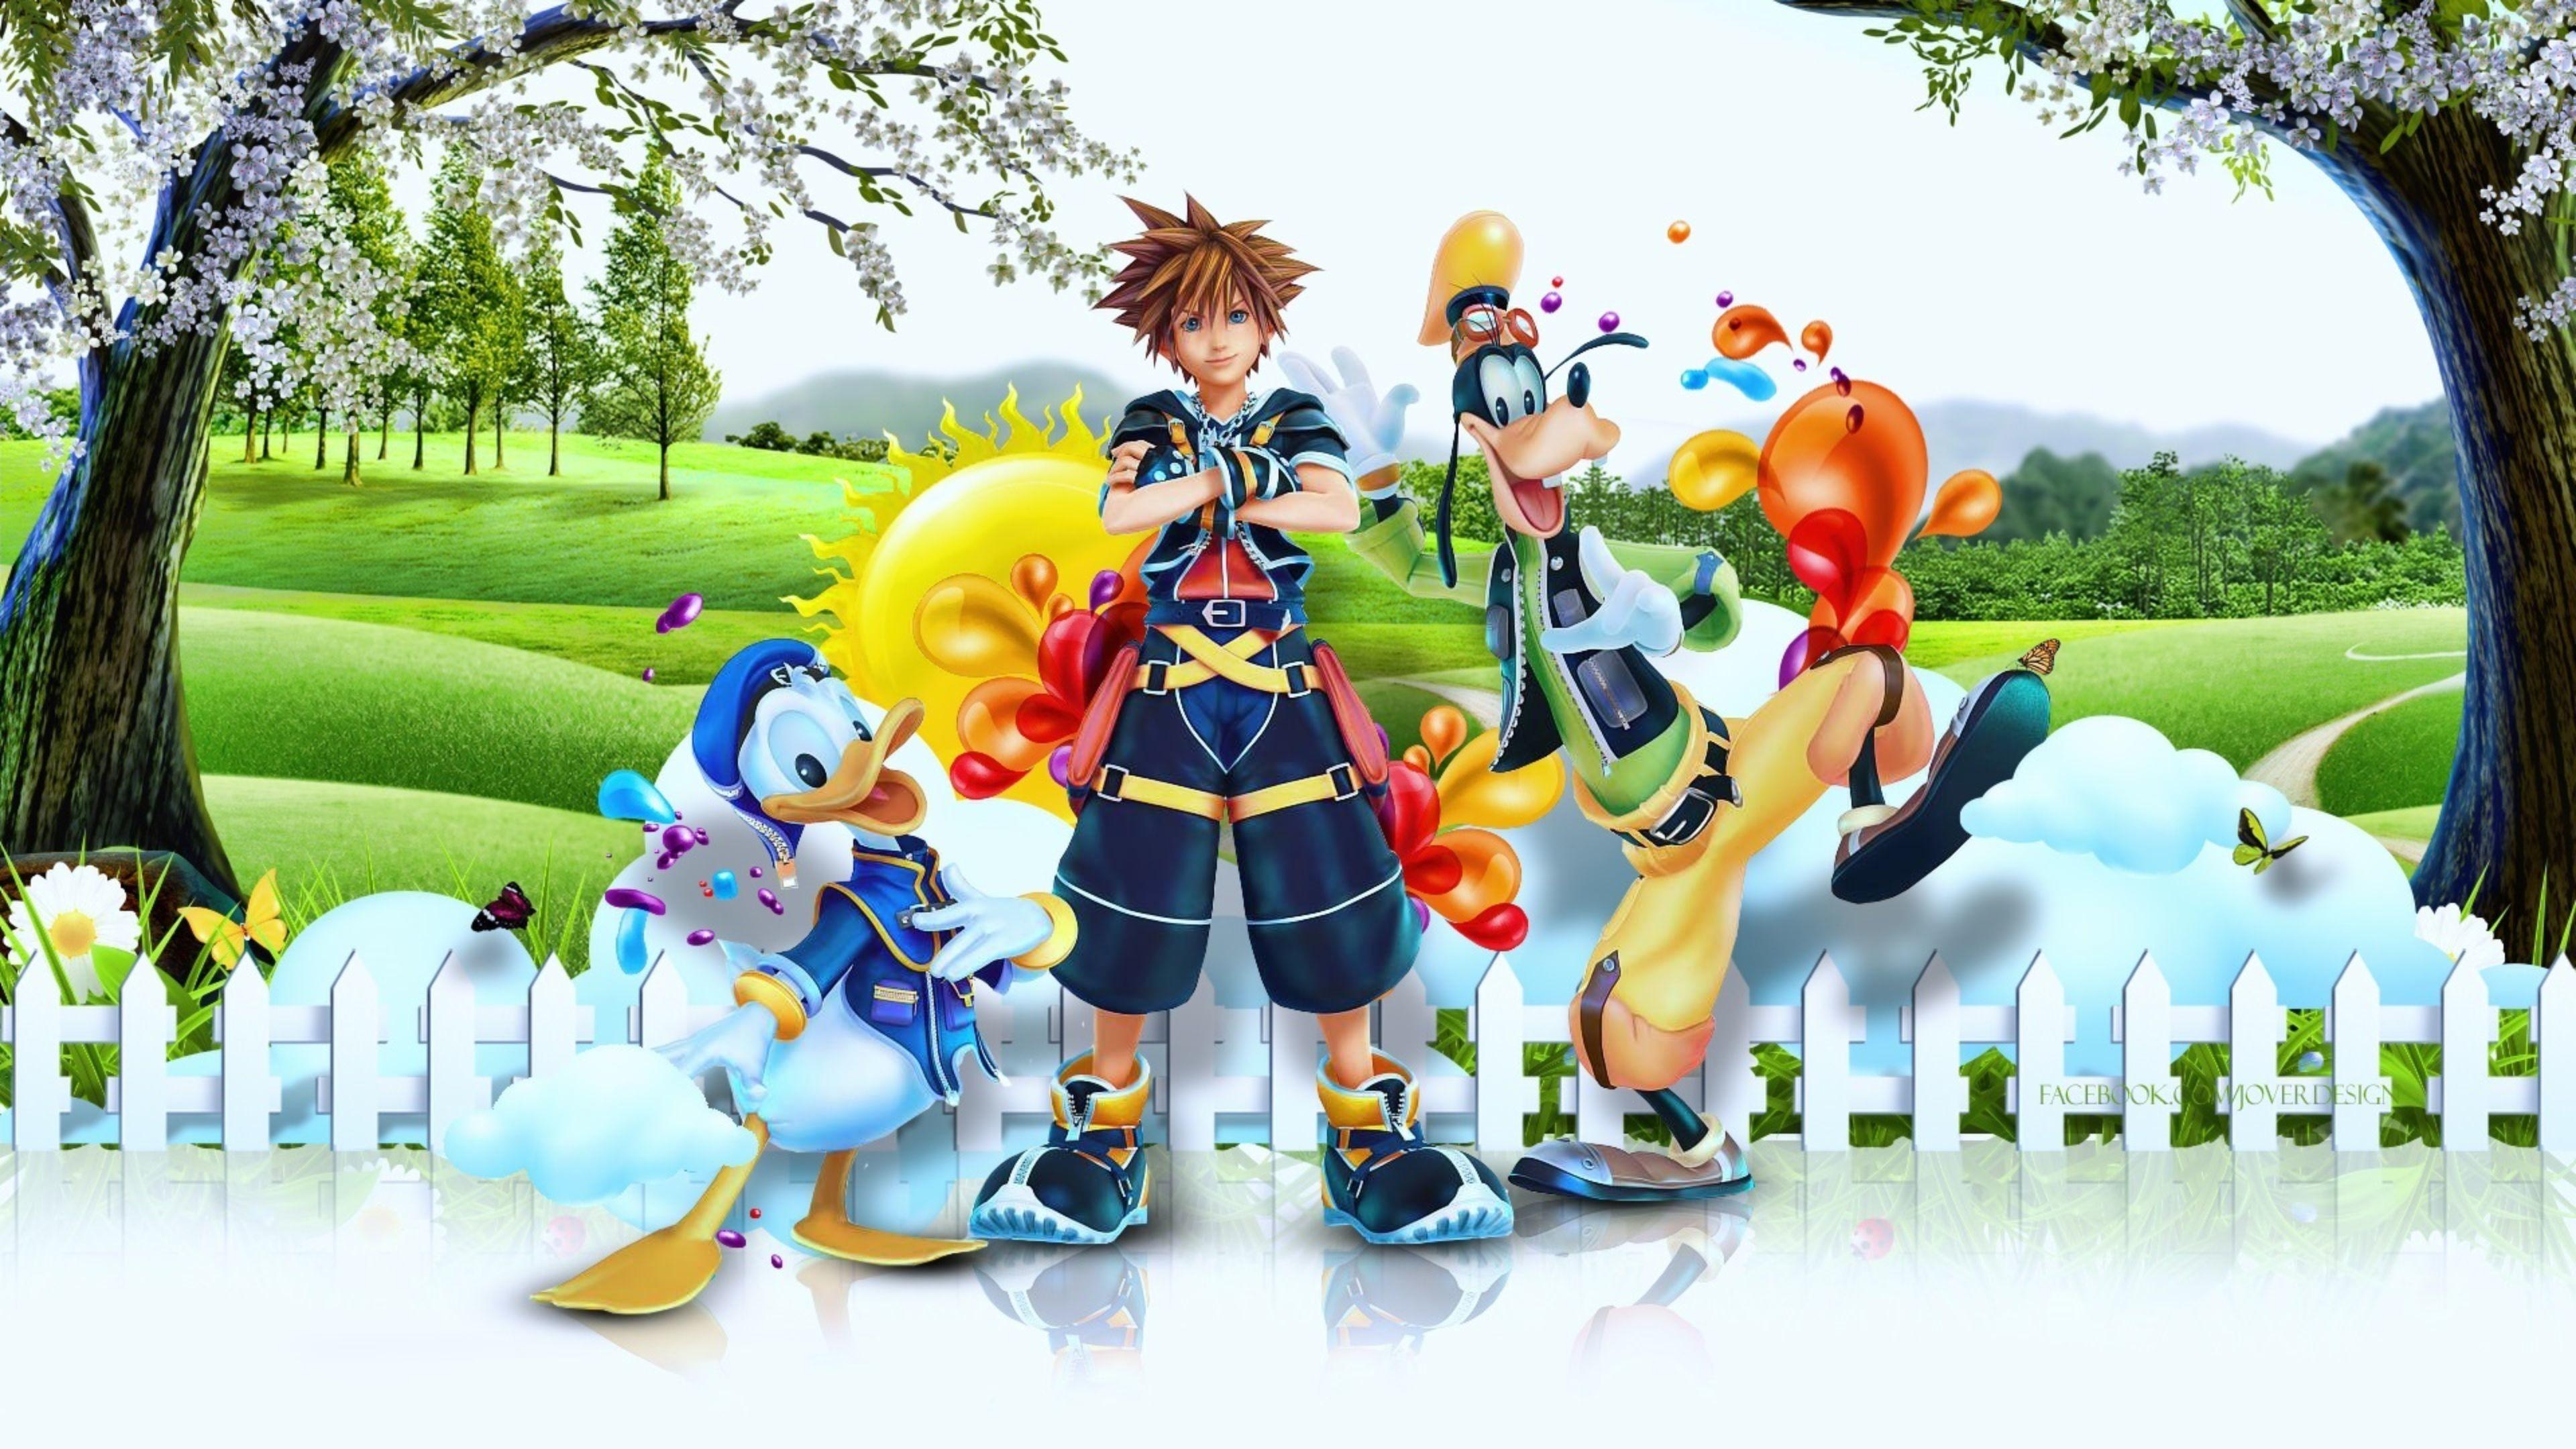 Amazing 2016 Kingdom Hearts 3 4K Wallpaper   Free 4K Wallpaper